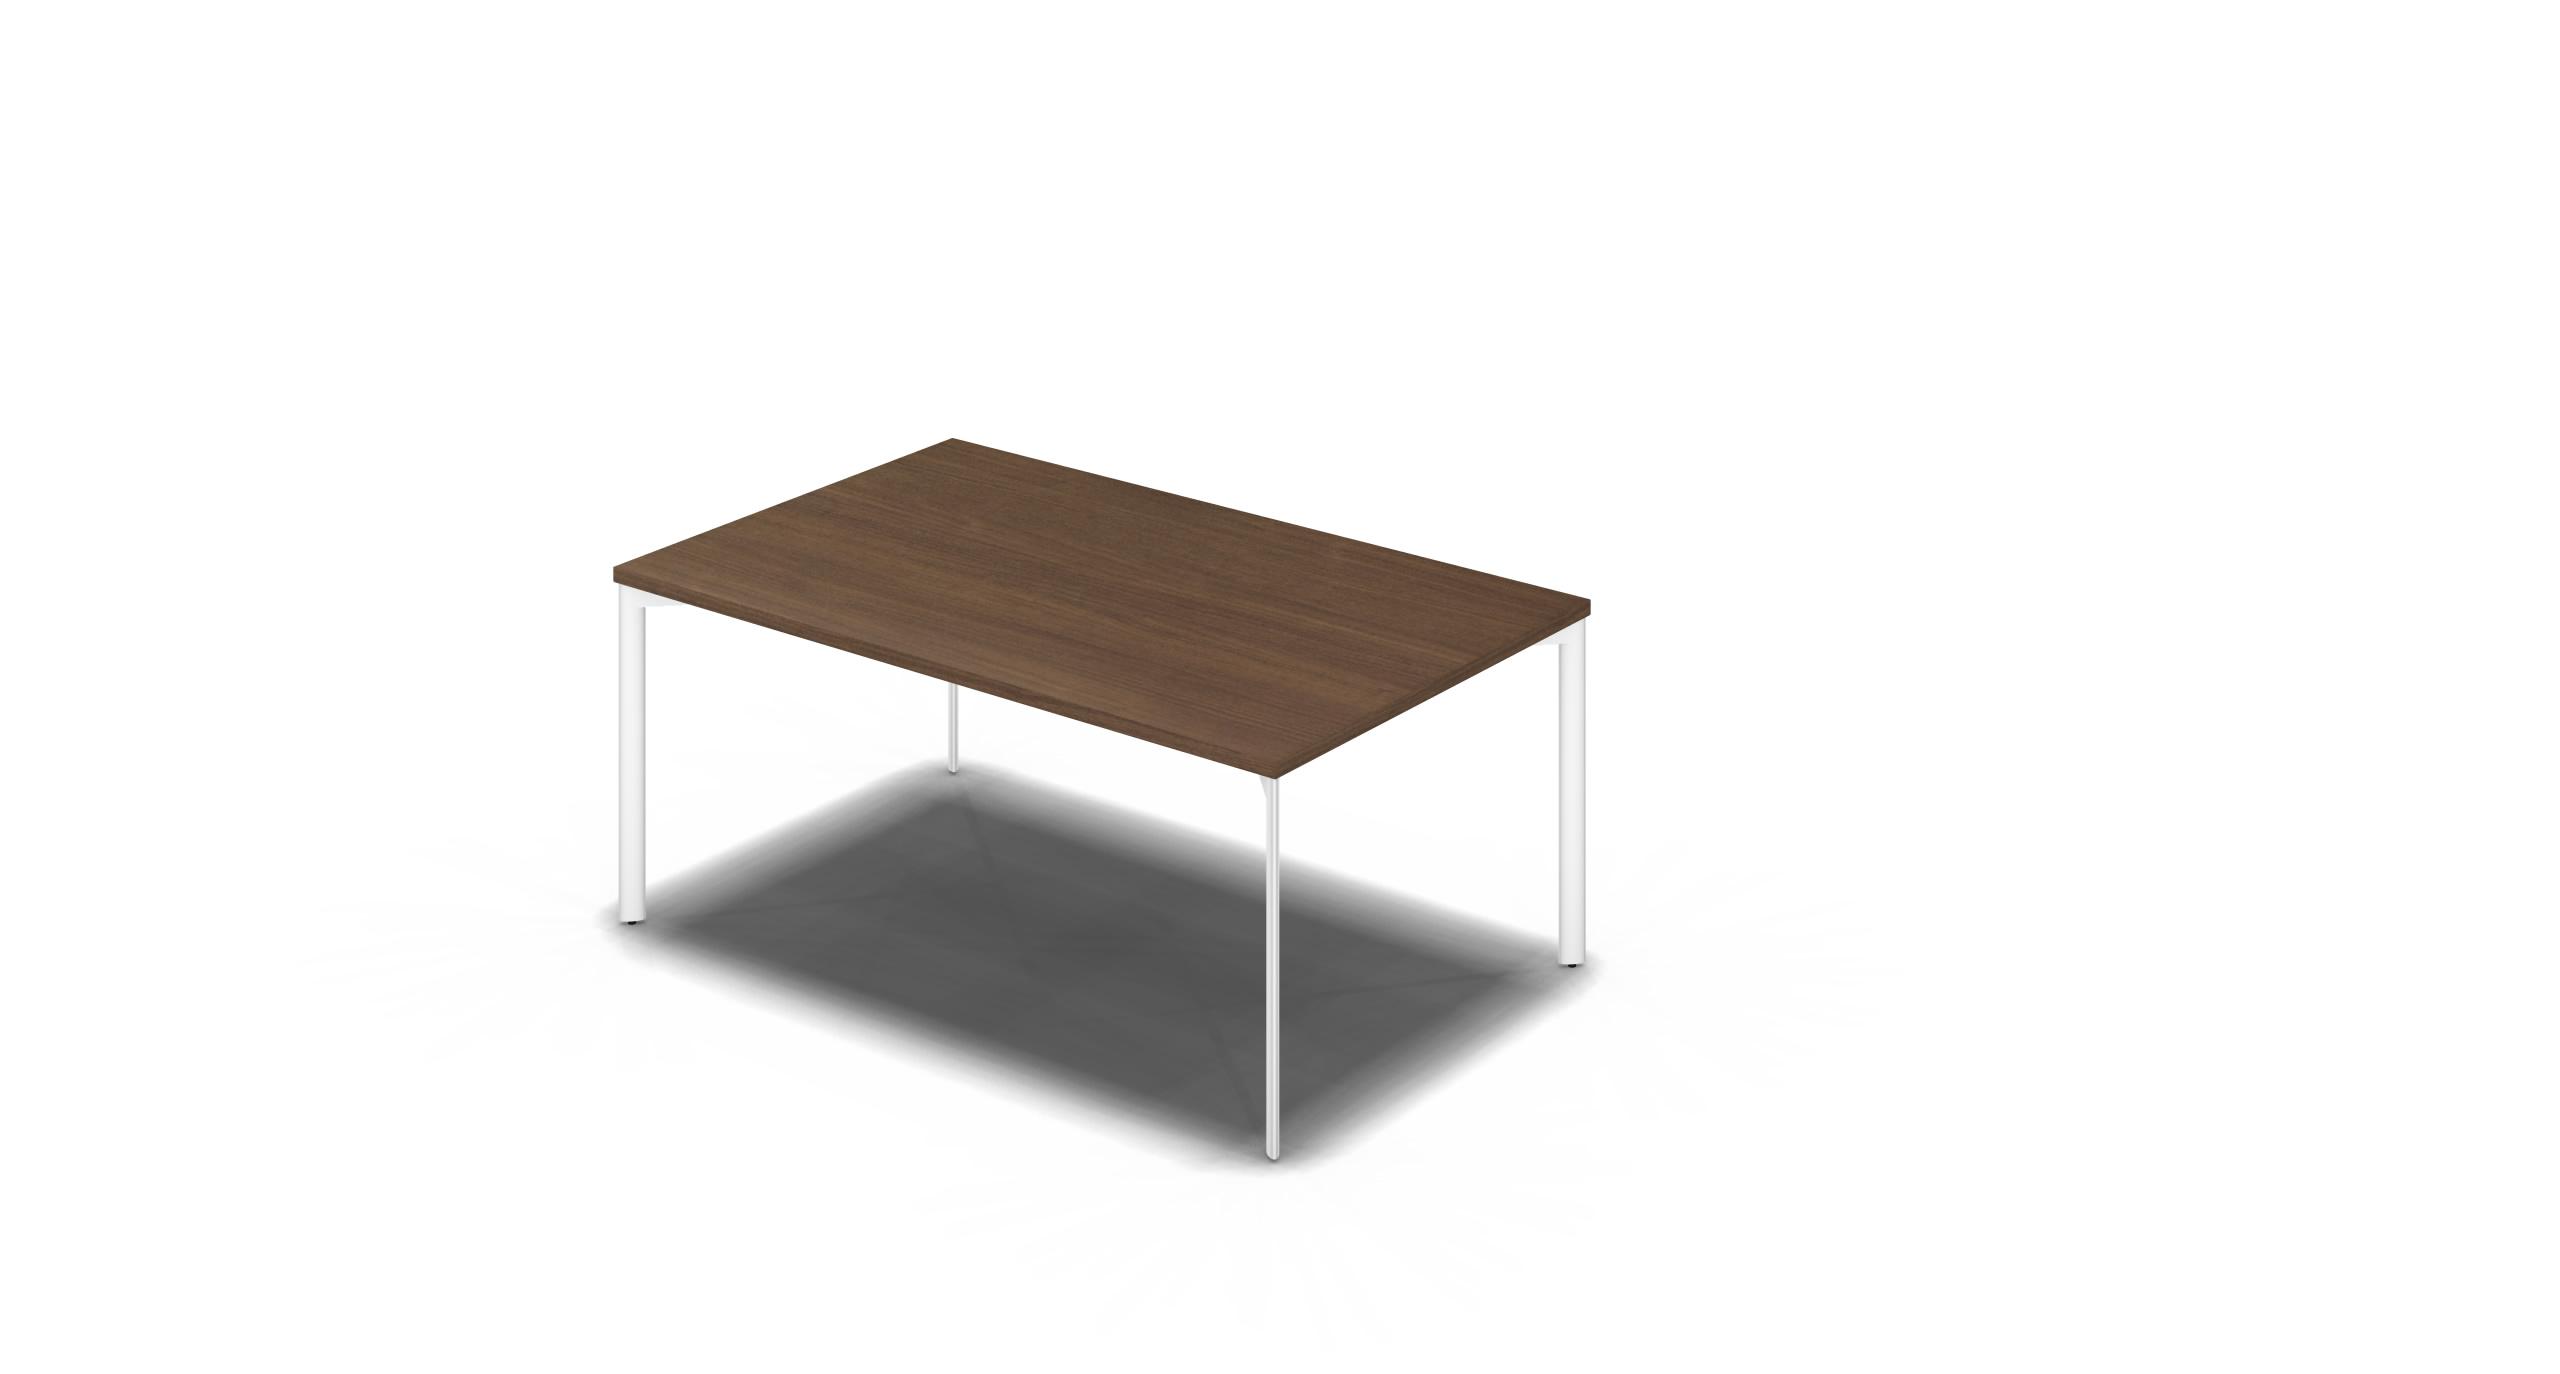 Table_Slim_1500x900_White_Walnut_noOption